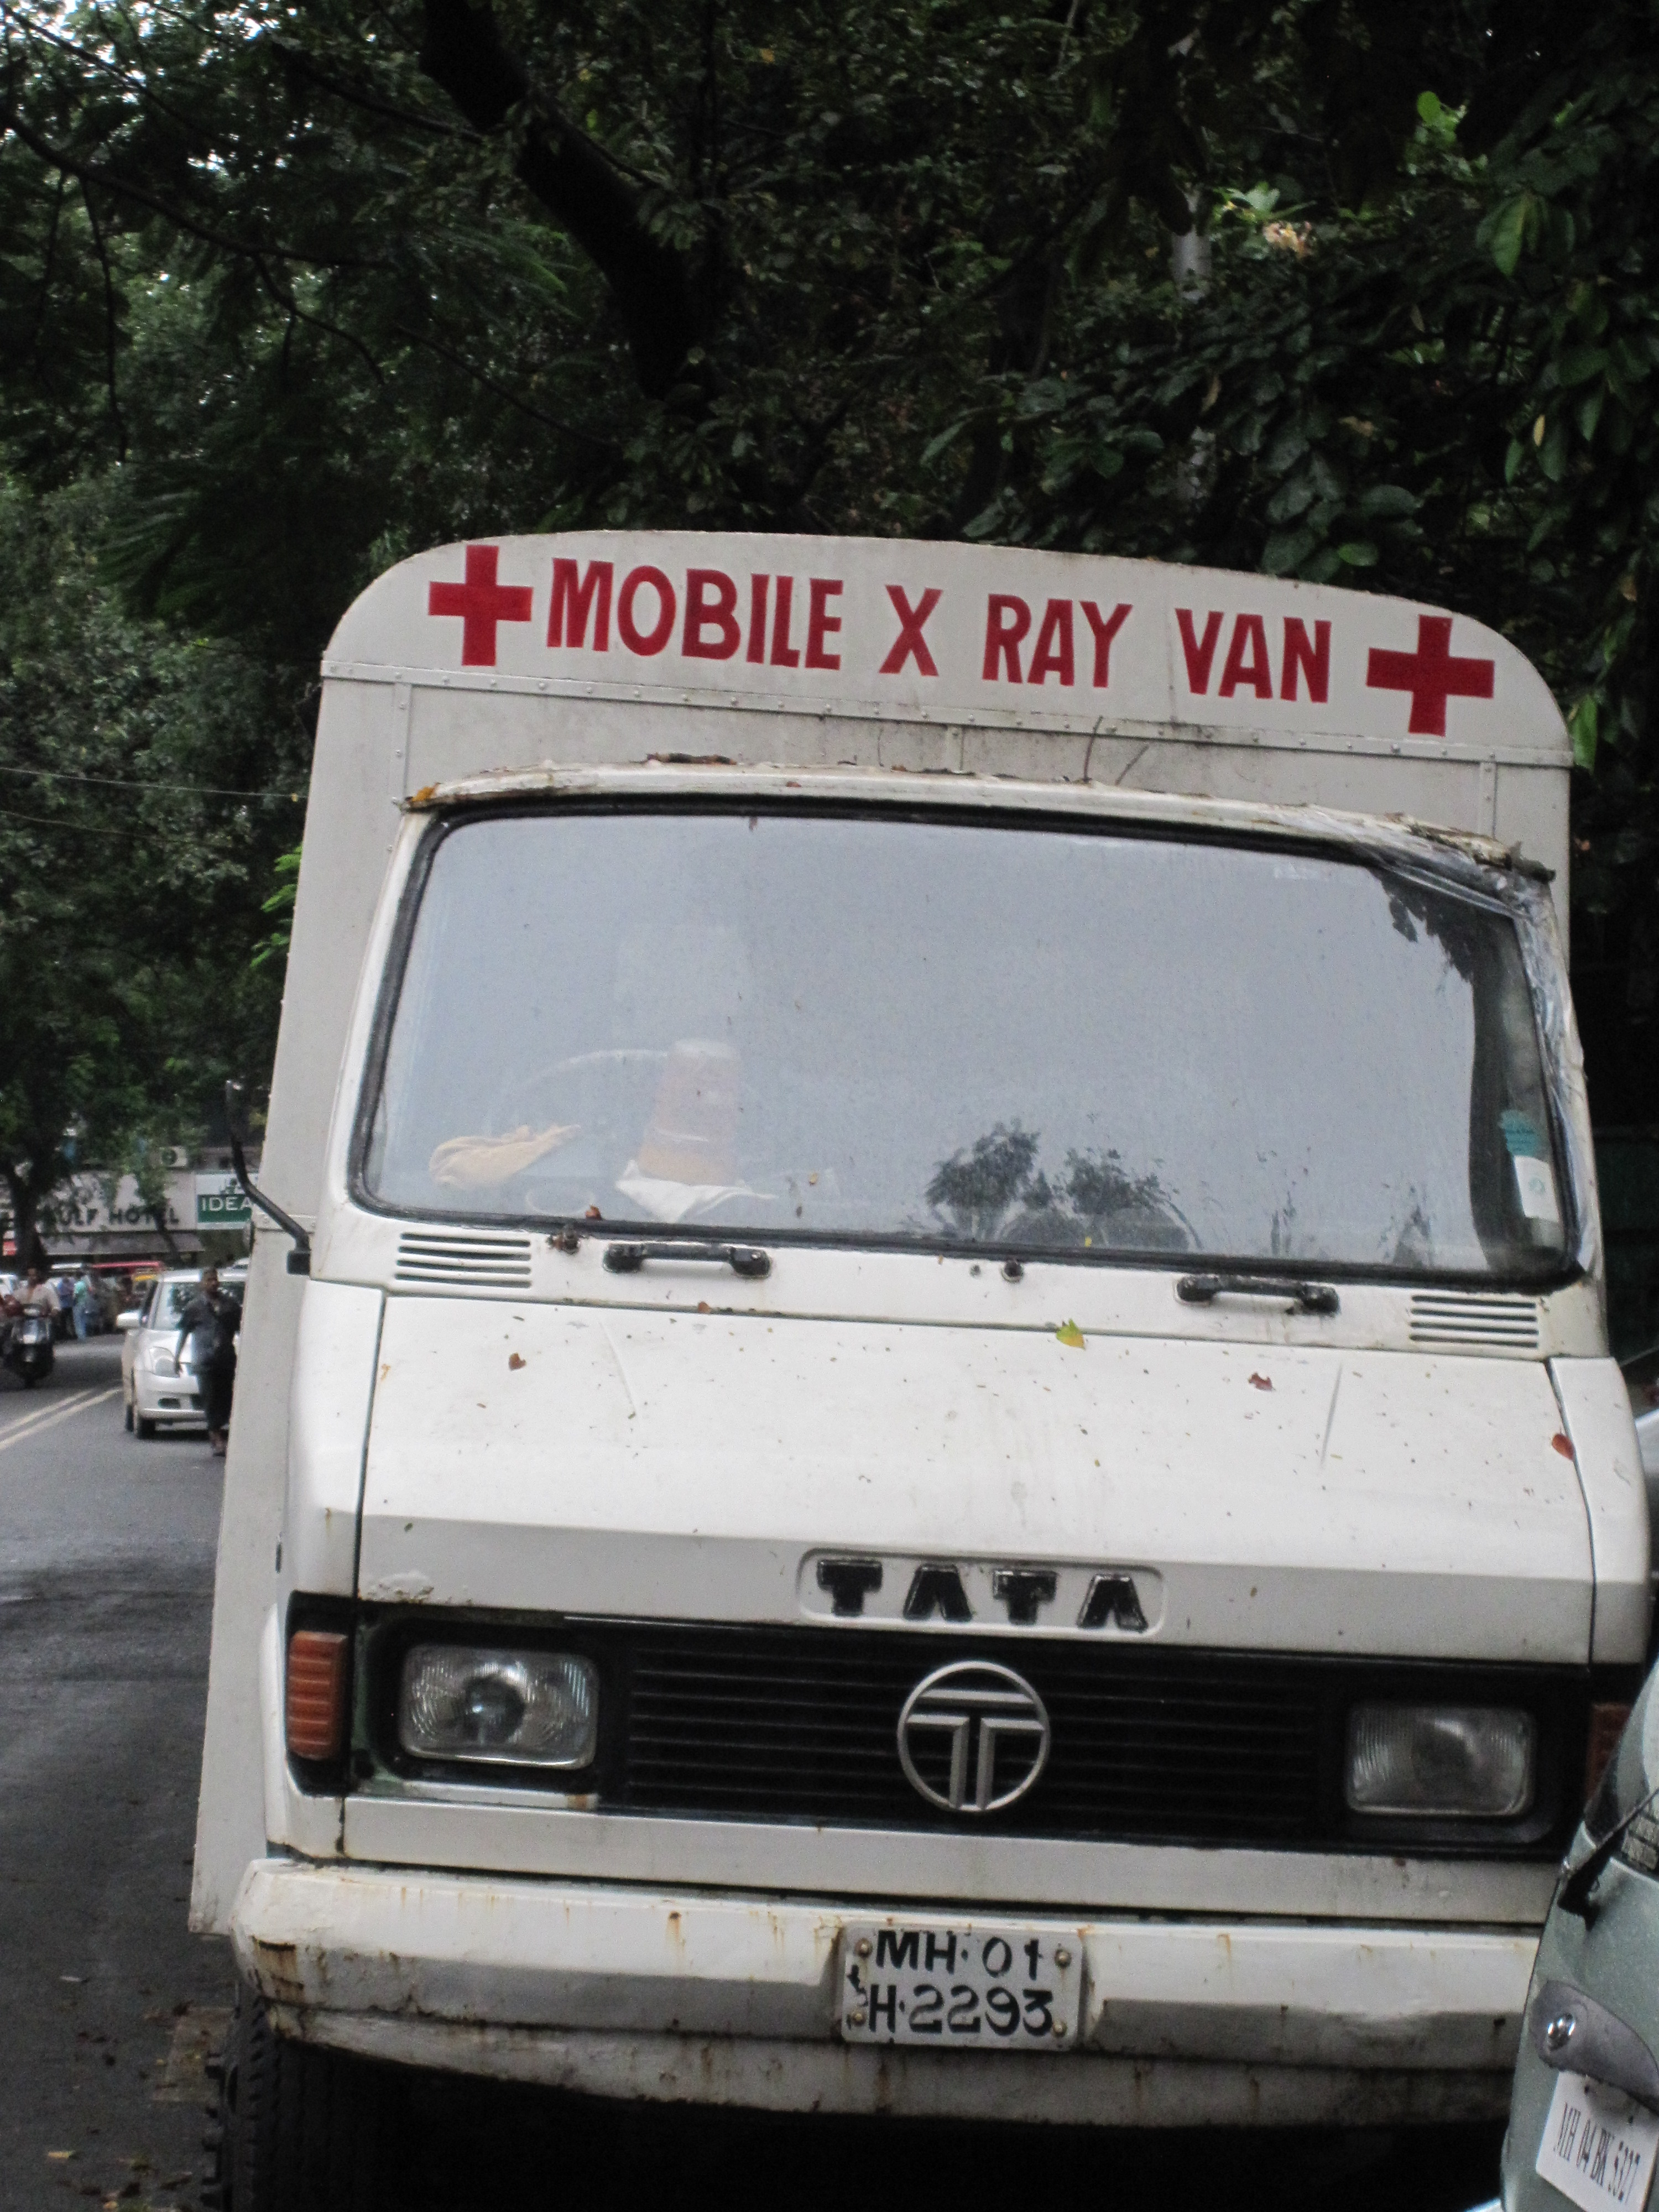 Mobile X Ray Van